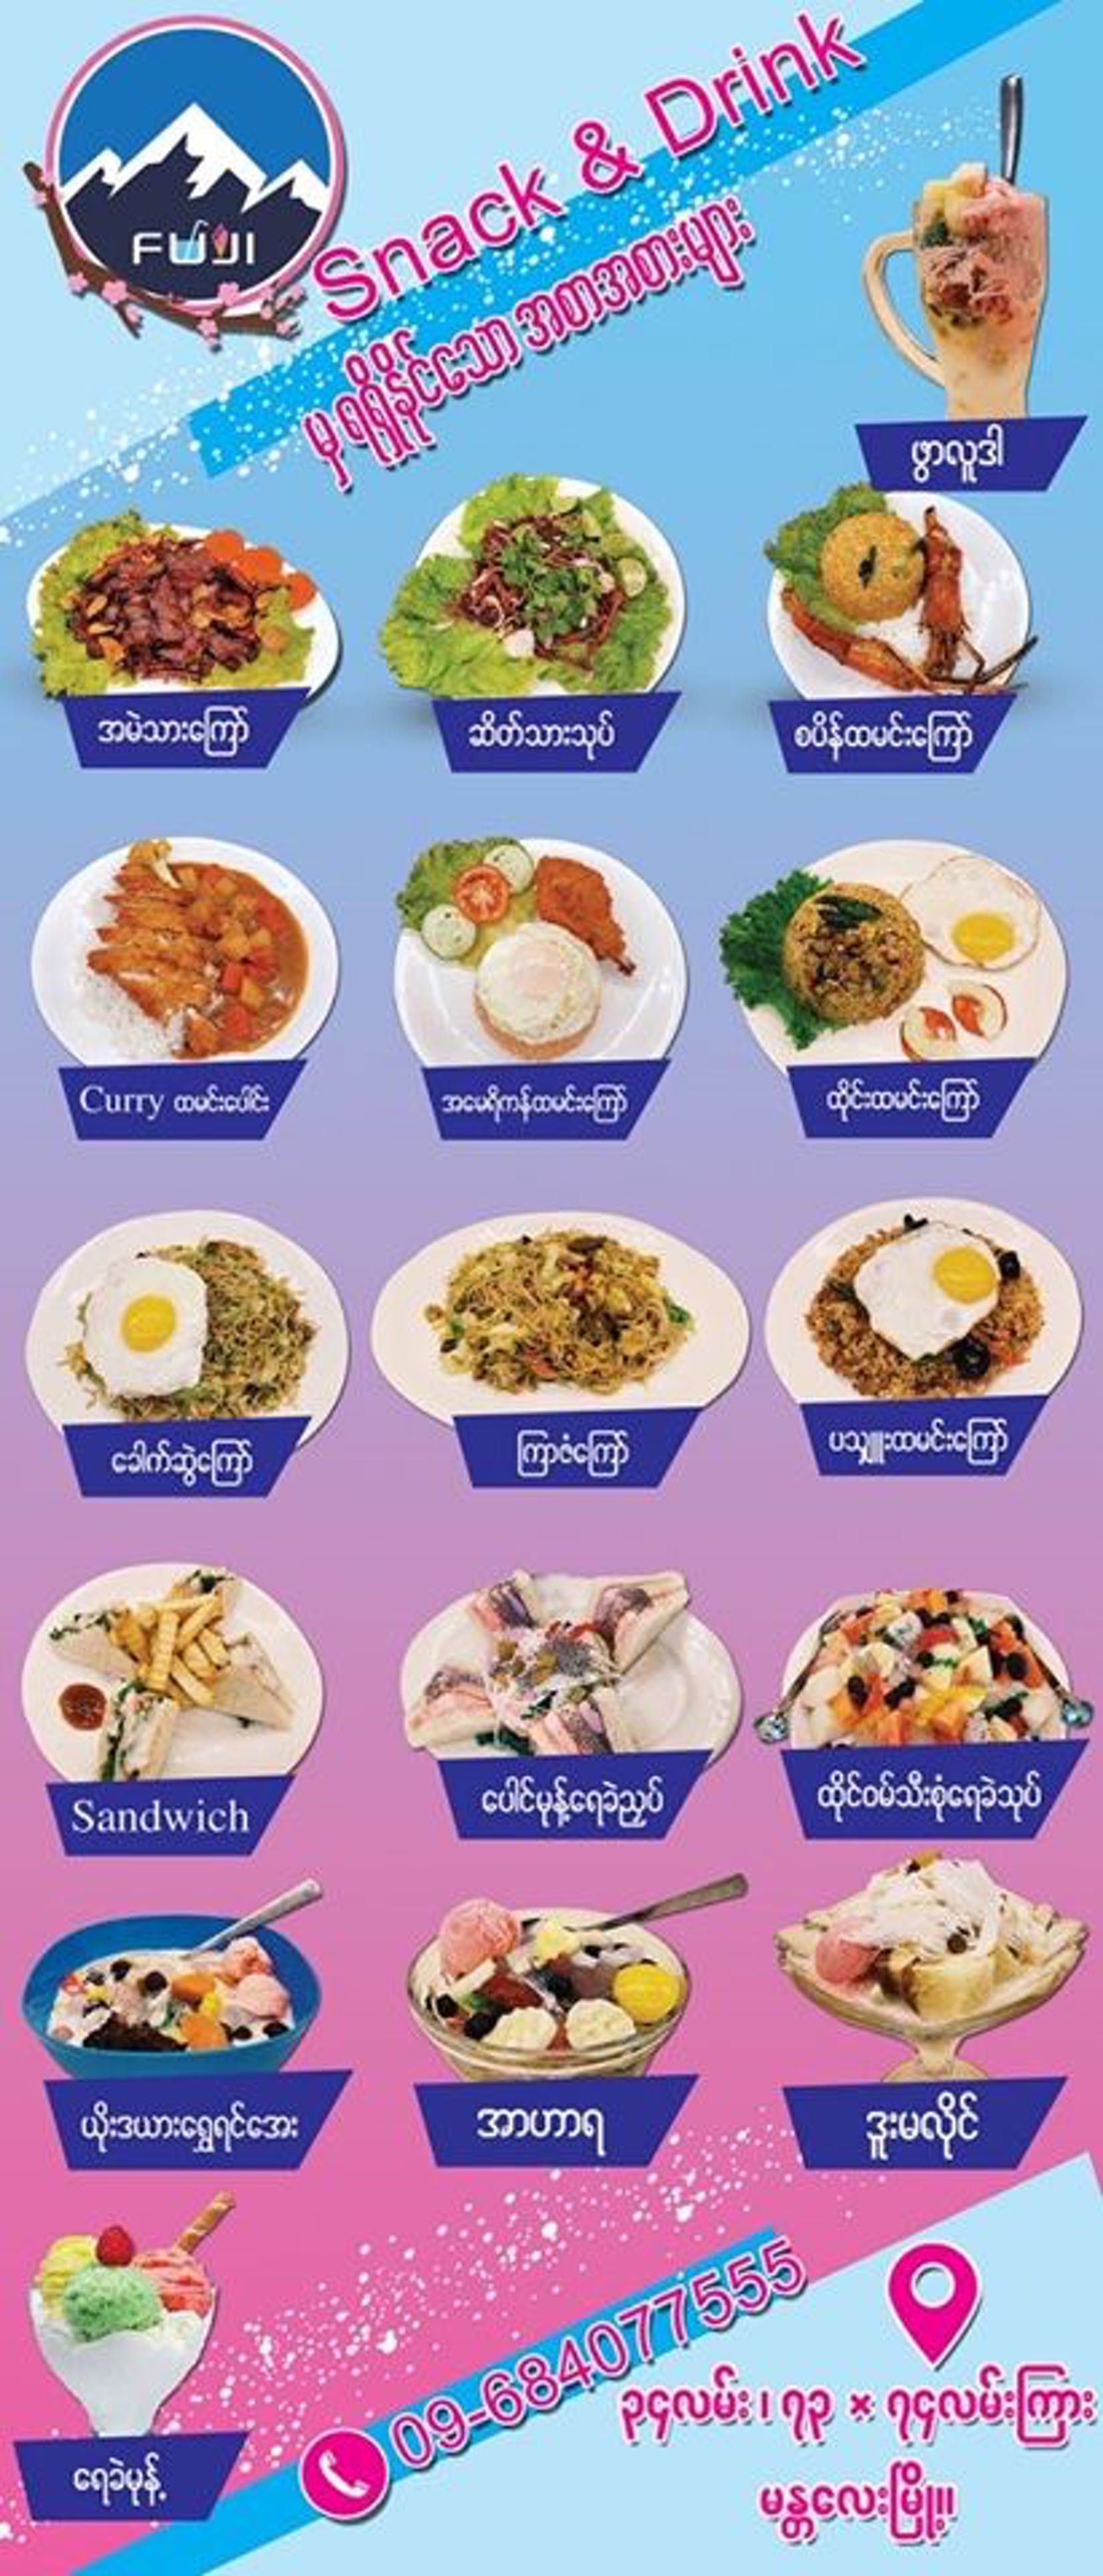 FUJI Seafood Snack & Drink | yathar